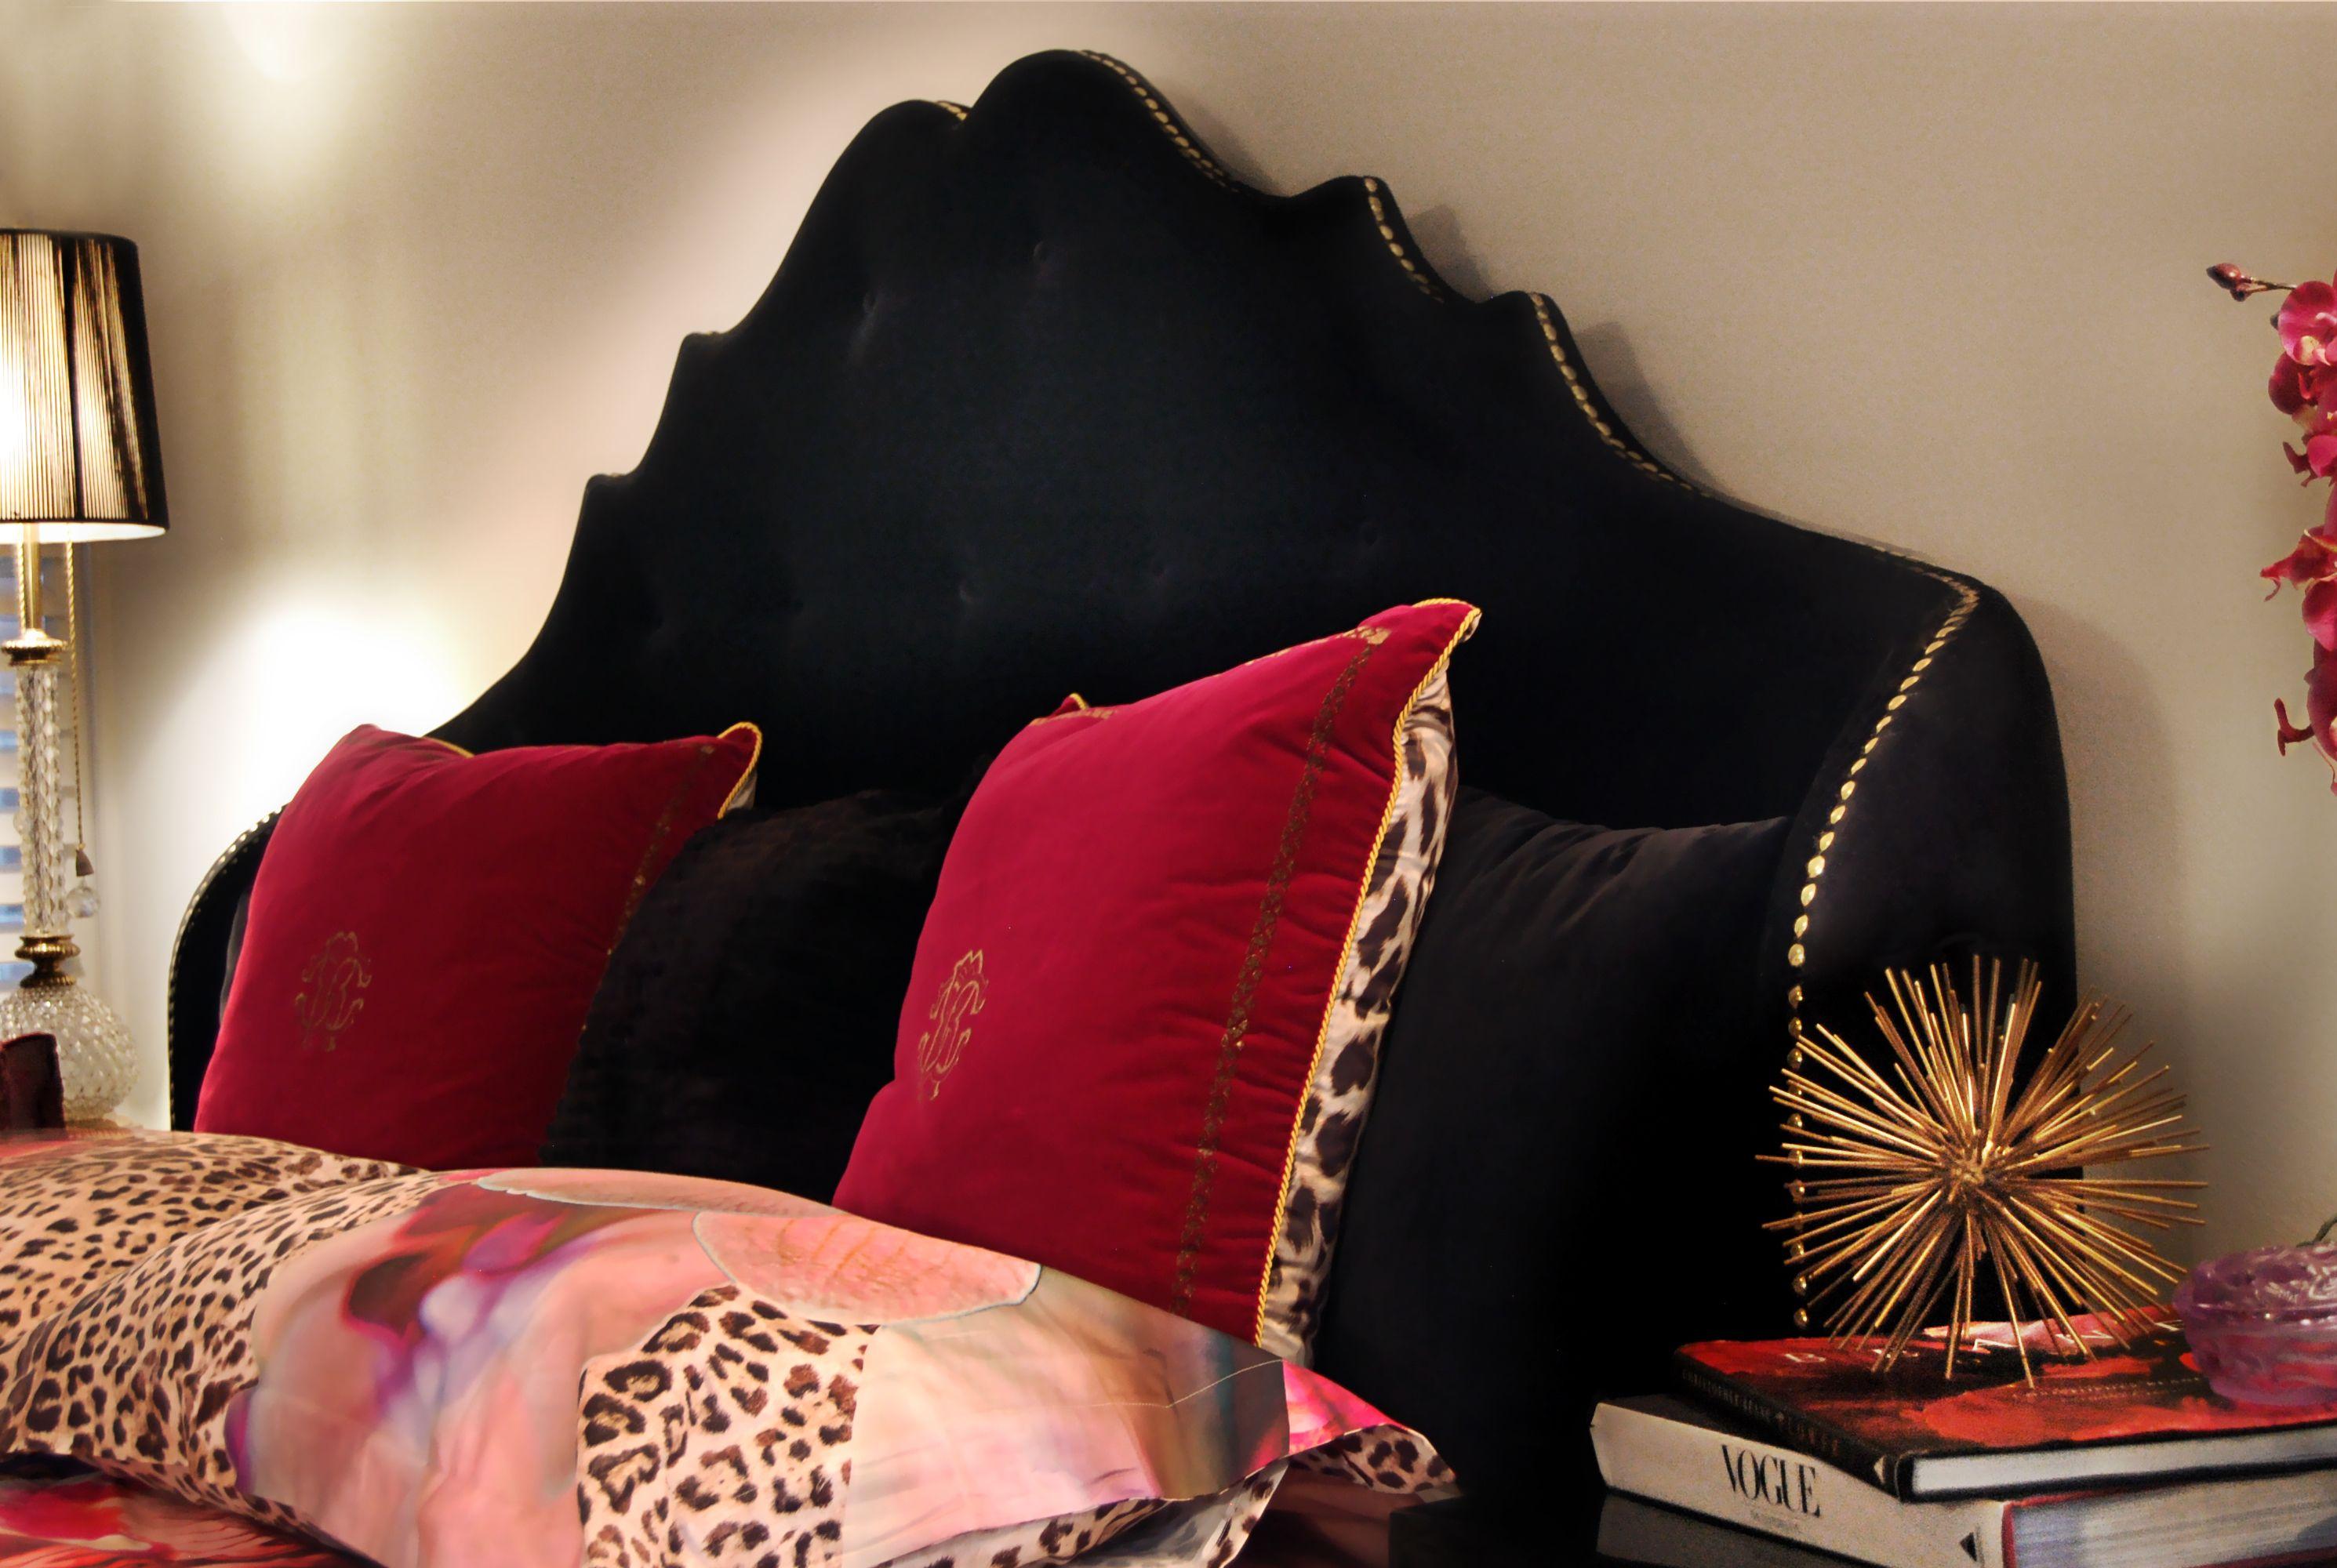 Black Bed ALEXIA by Koket Velvet headboard, Colorful